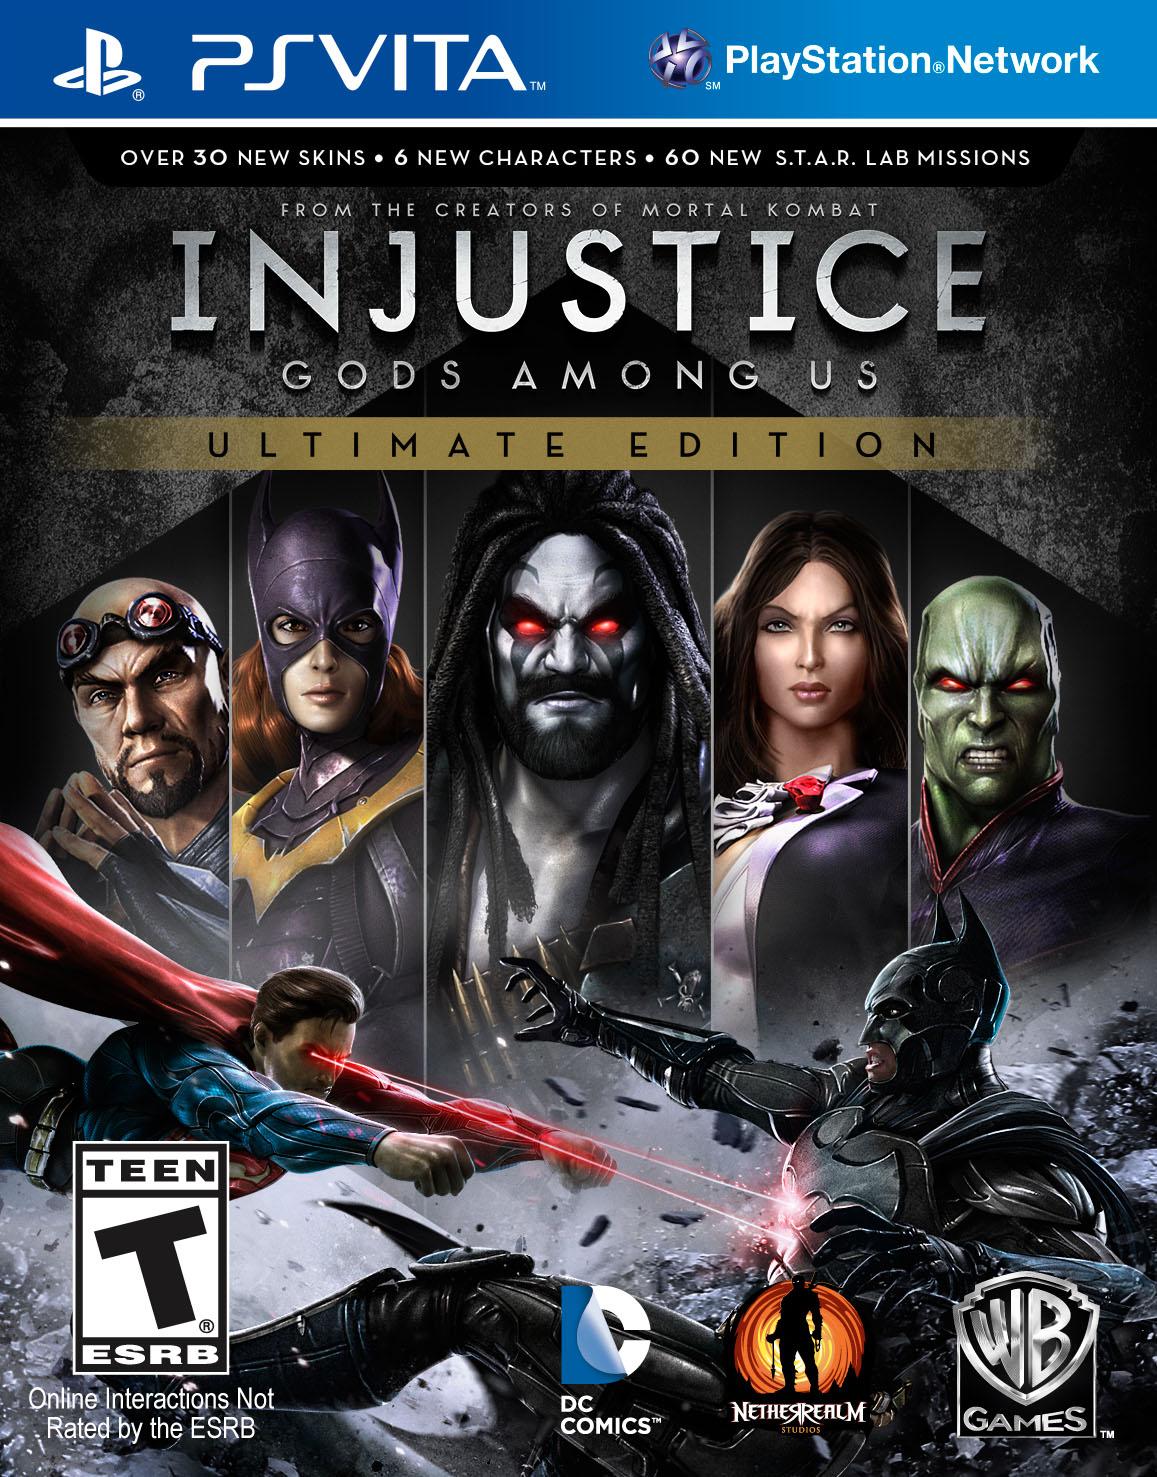 Injustice-PSV-Box-Art.jpg